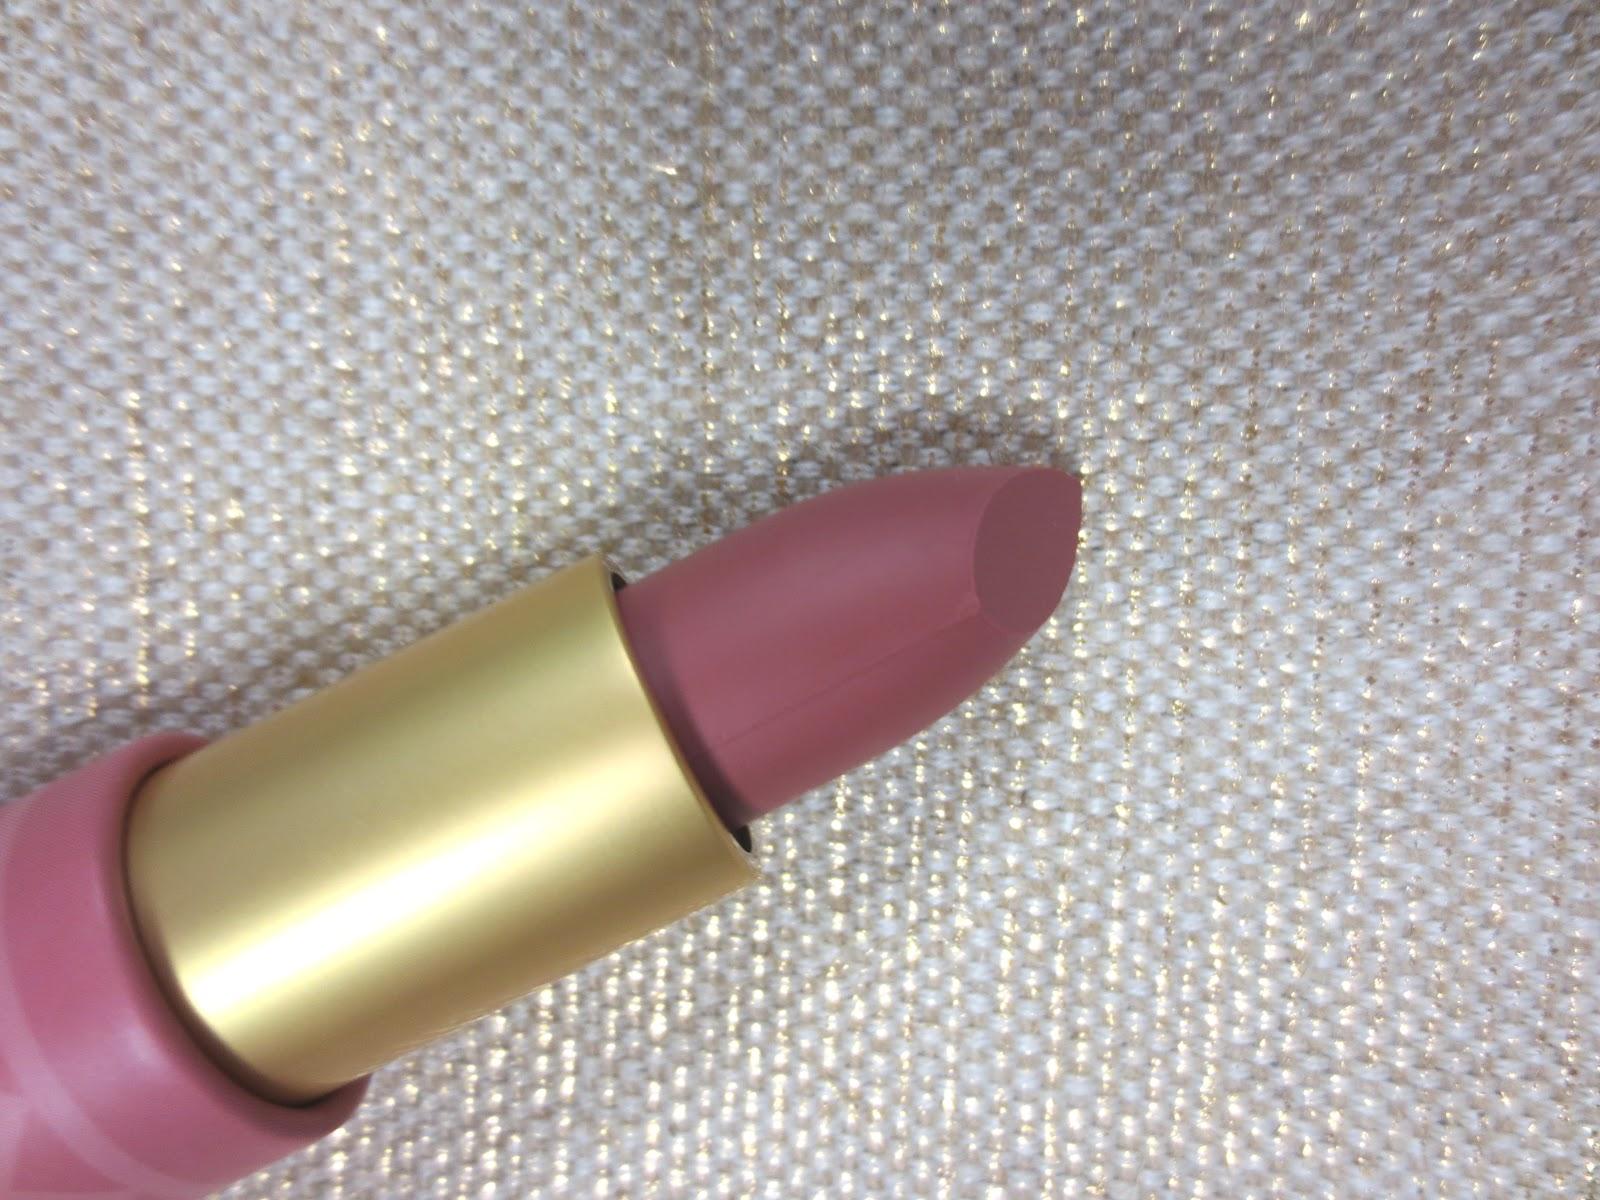 Never Enough Gloss Tarte Amazonian Butter Lipstick In Plummy Rose